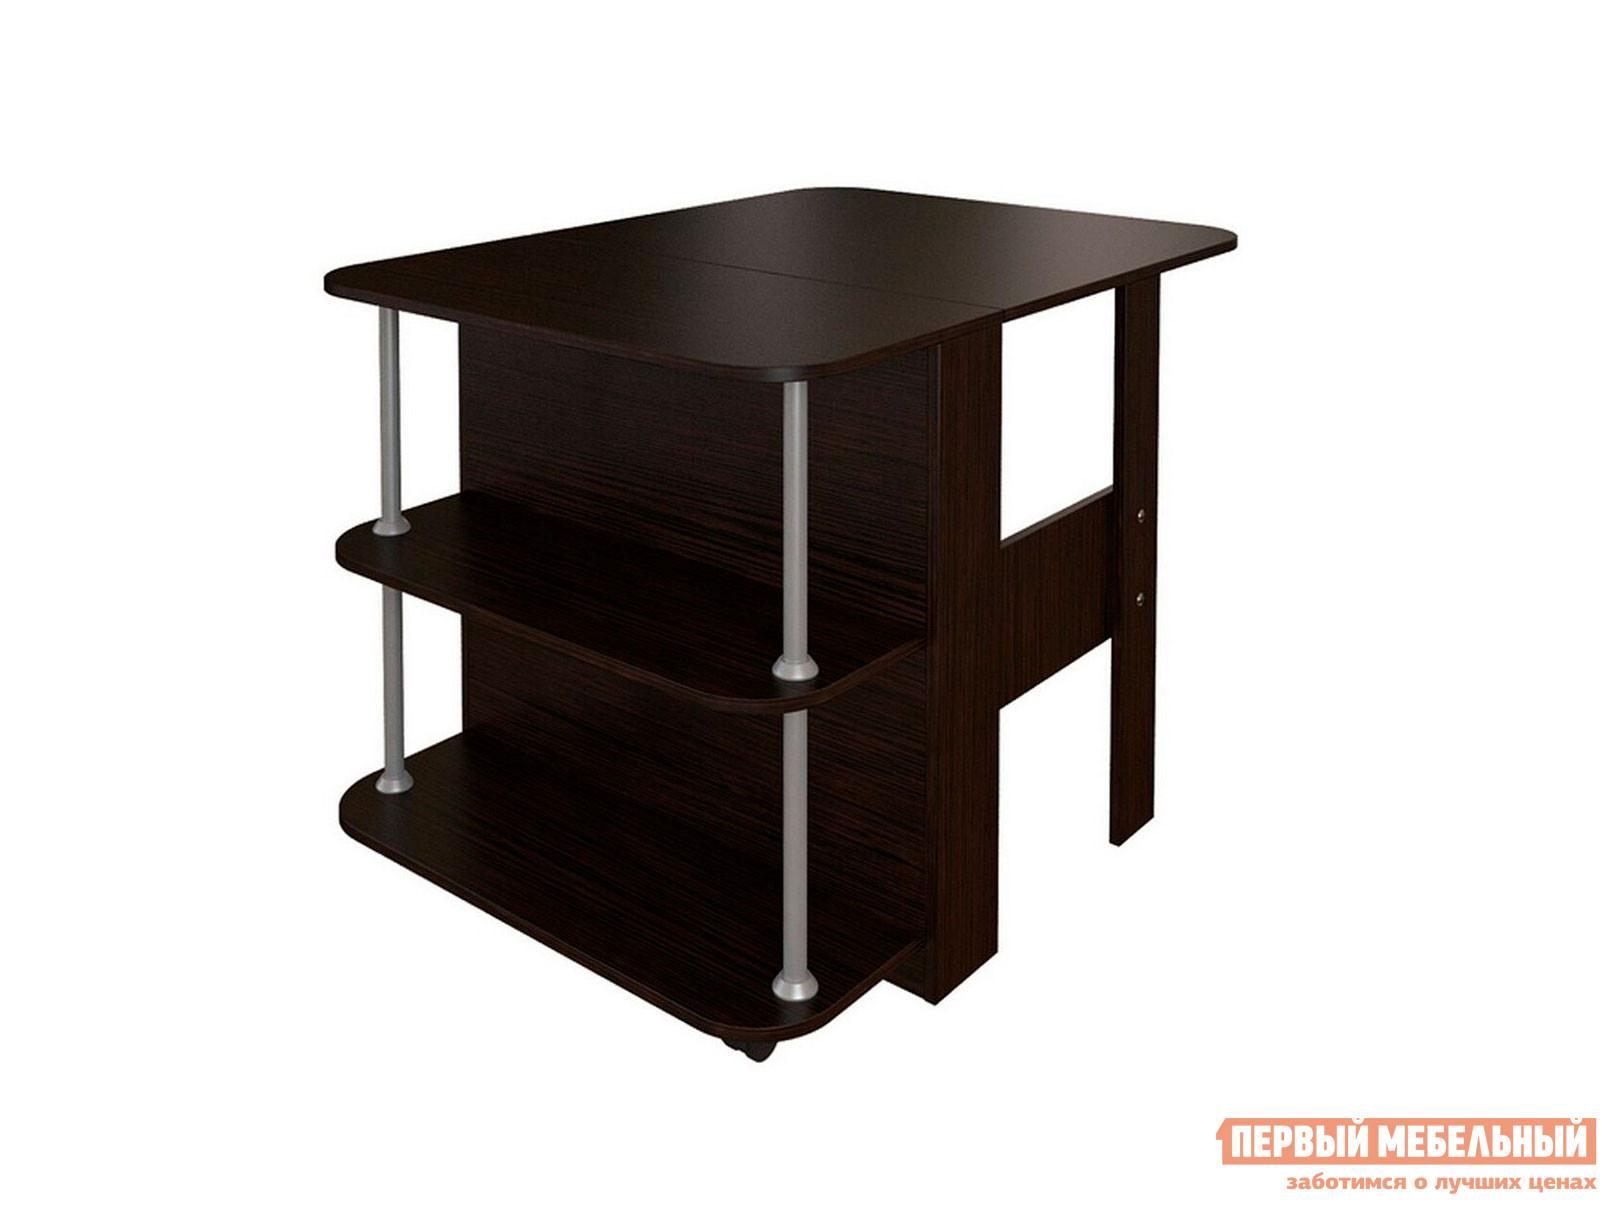 Кухонный стол  Стол-книжка Луиза Венге — Стол-книжка Луиза Венге